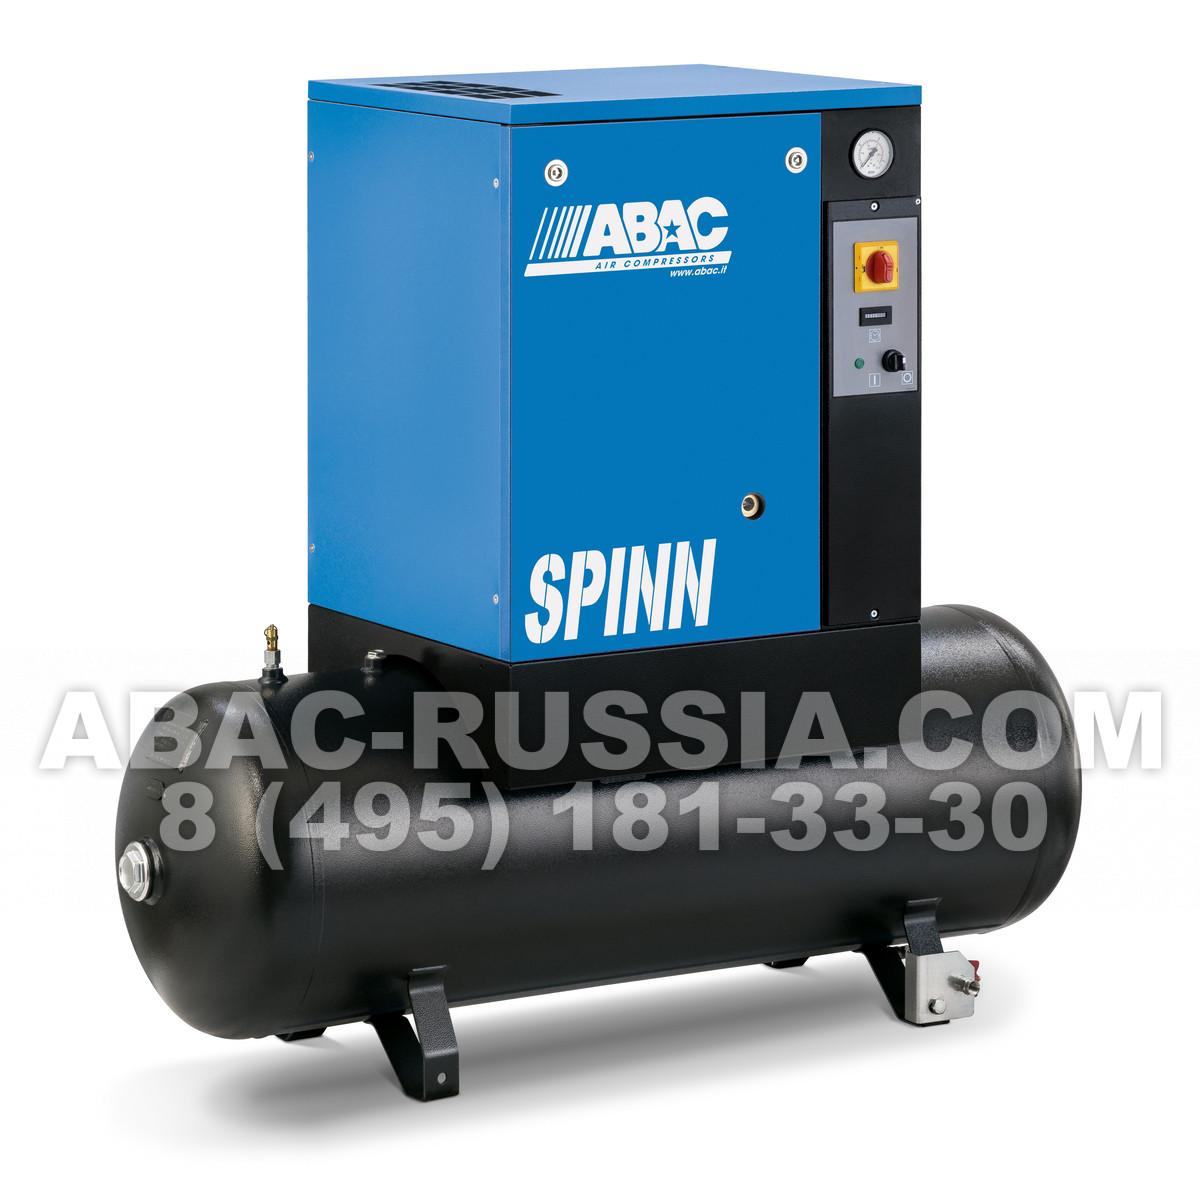 Винтовой компрессор ABAC SPINN 2.210-200 V220 4152008006